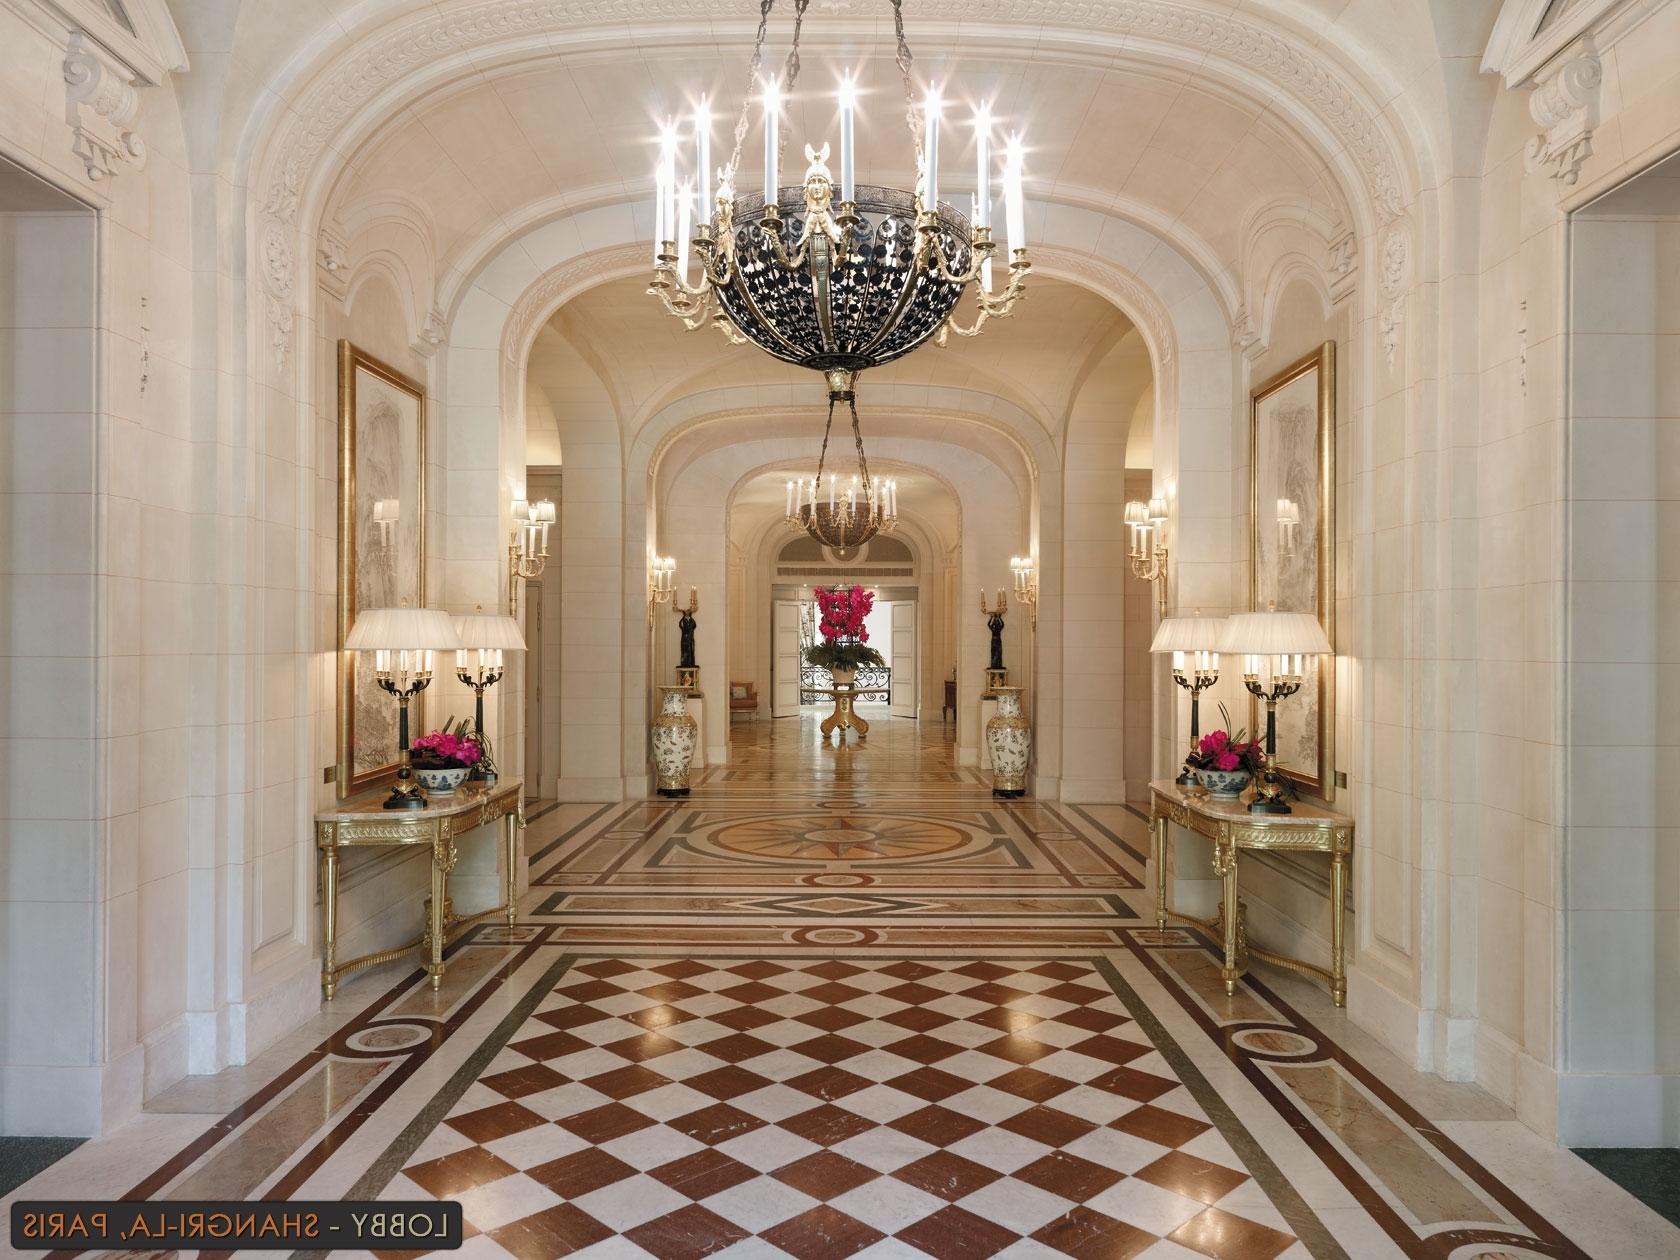 Preferred 5 Star Shangri La Hotel, Paris (View 7 of 20)